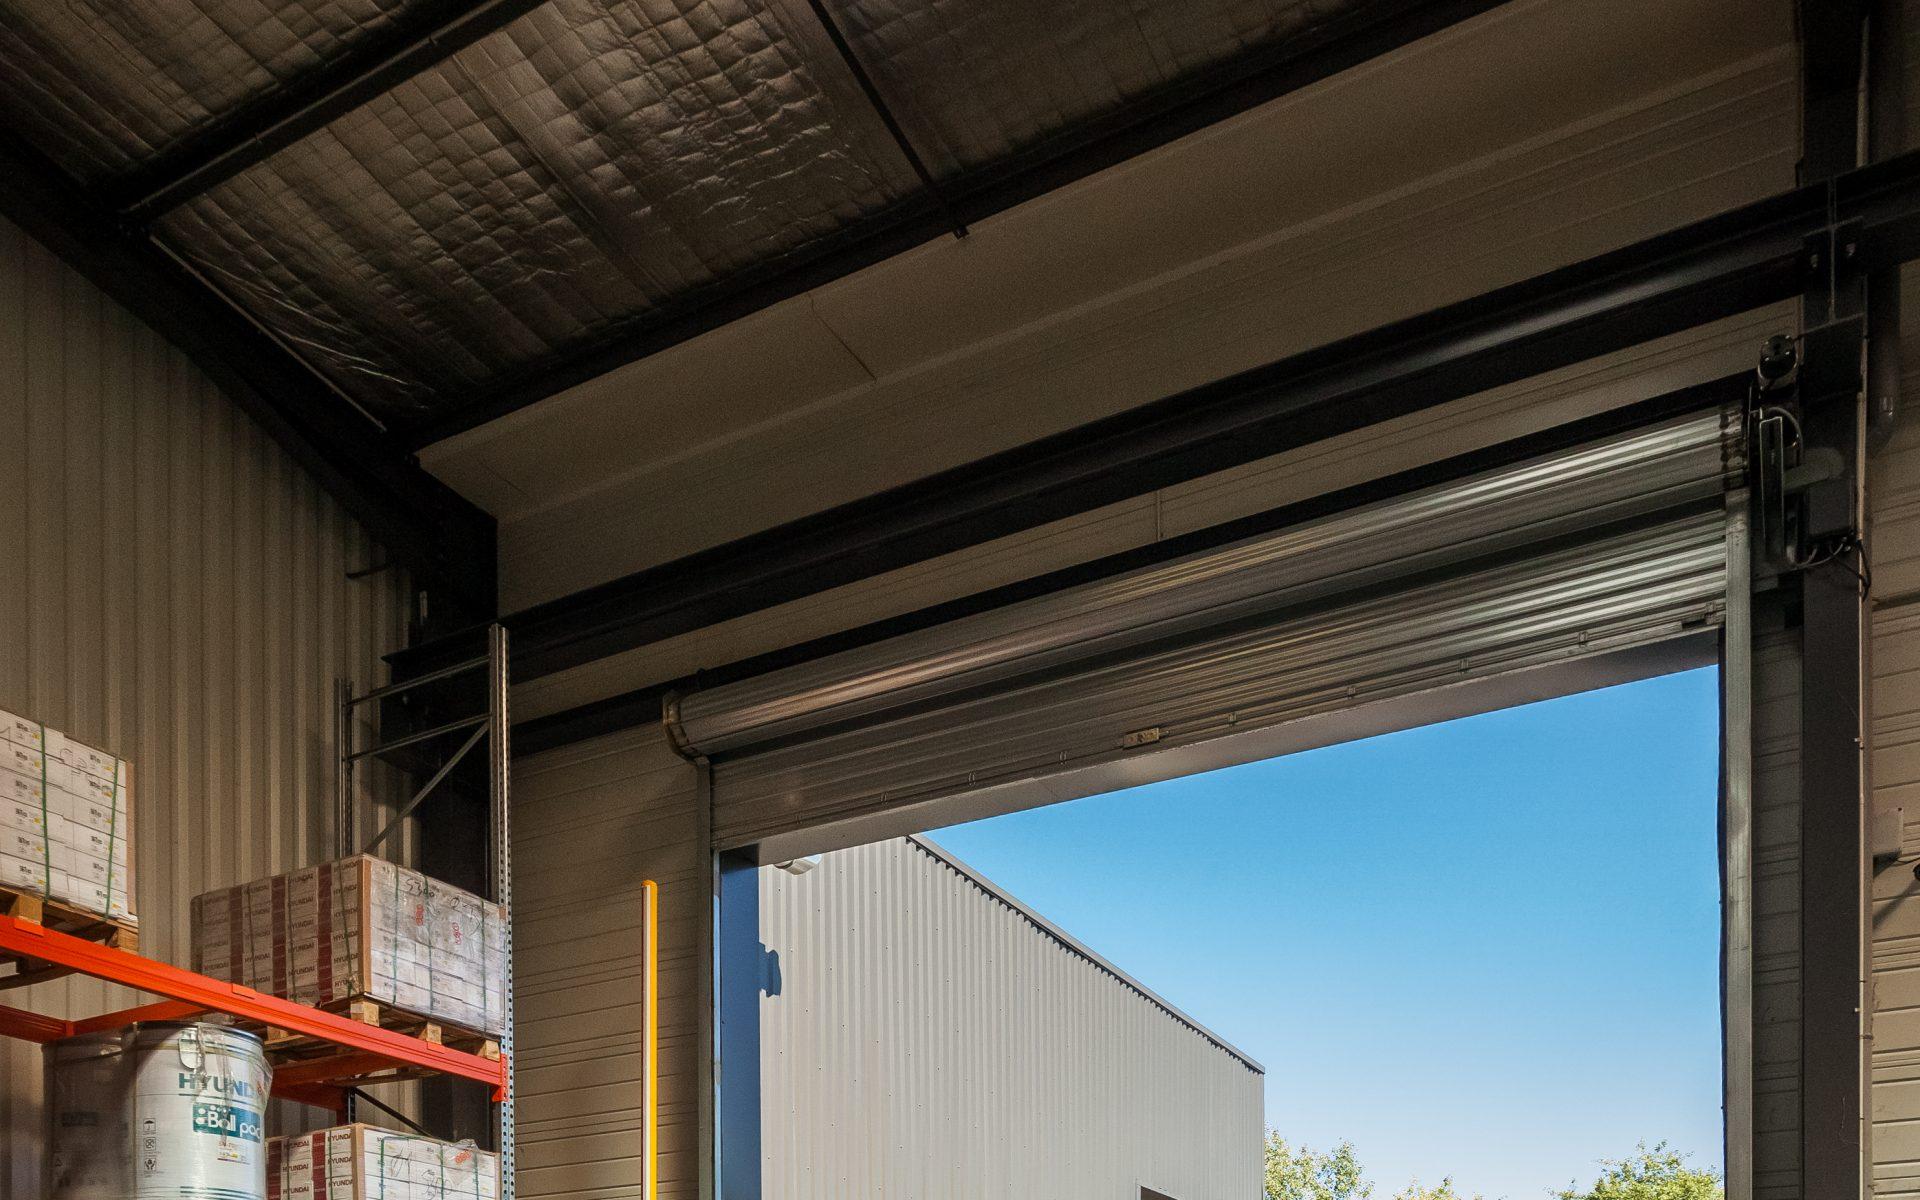 somefi bâtiment industriel Bureaux stockage